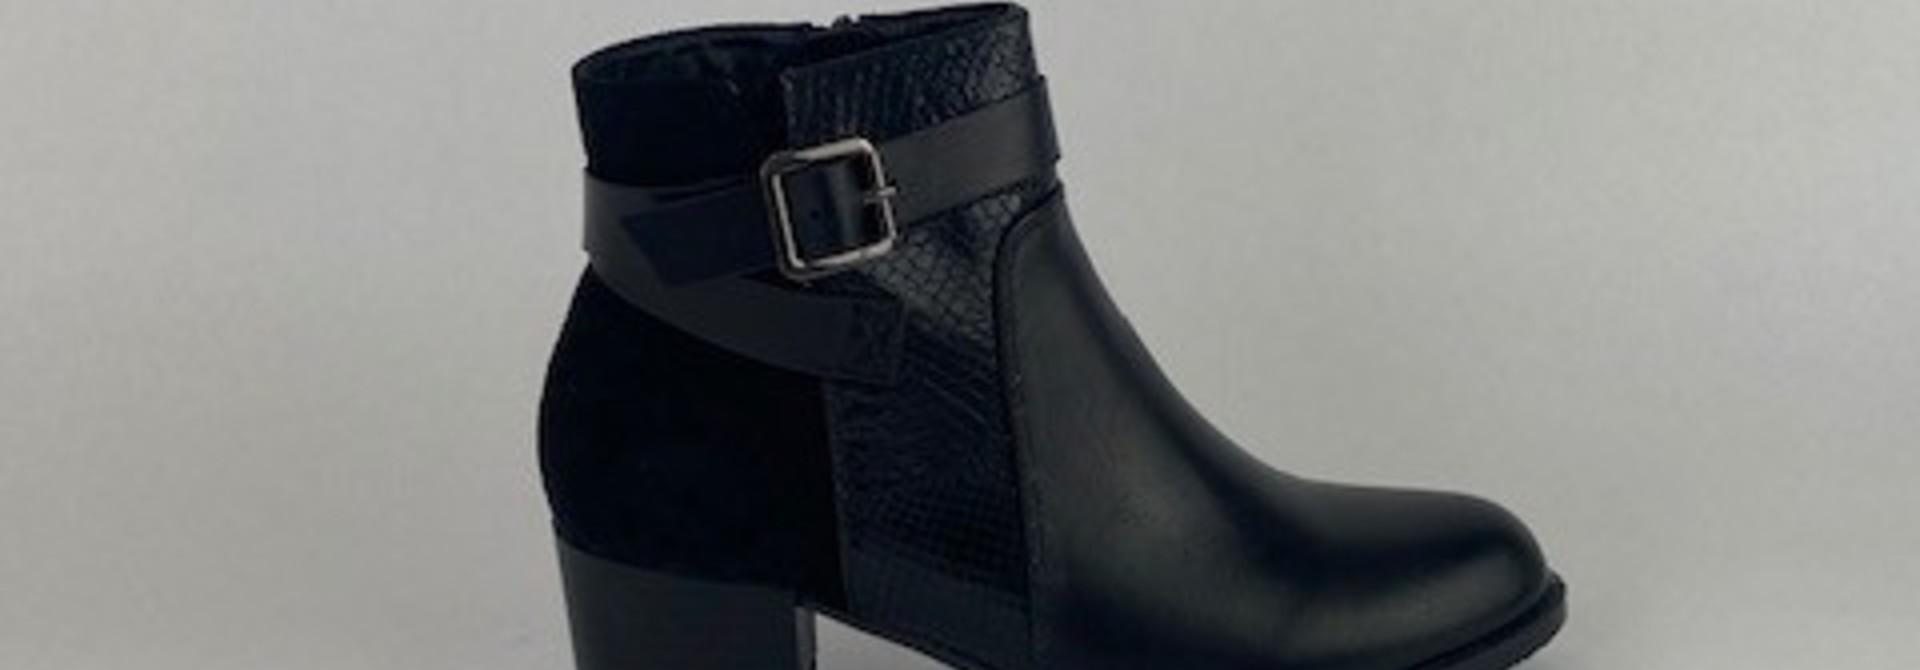 Nymhe boots Black